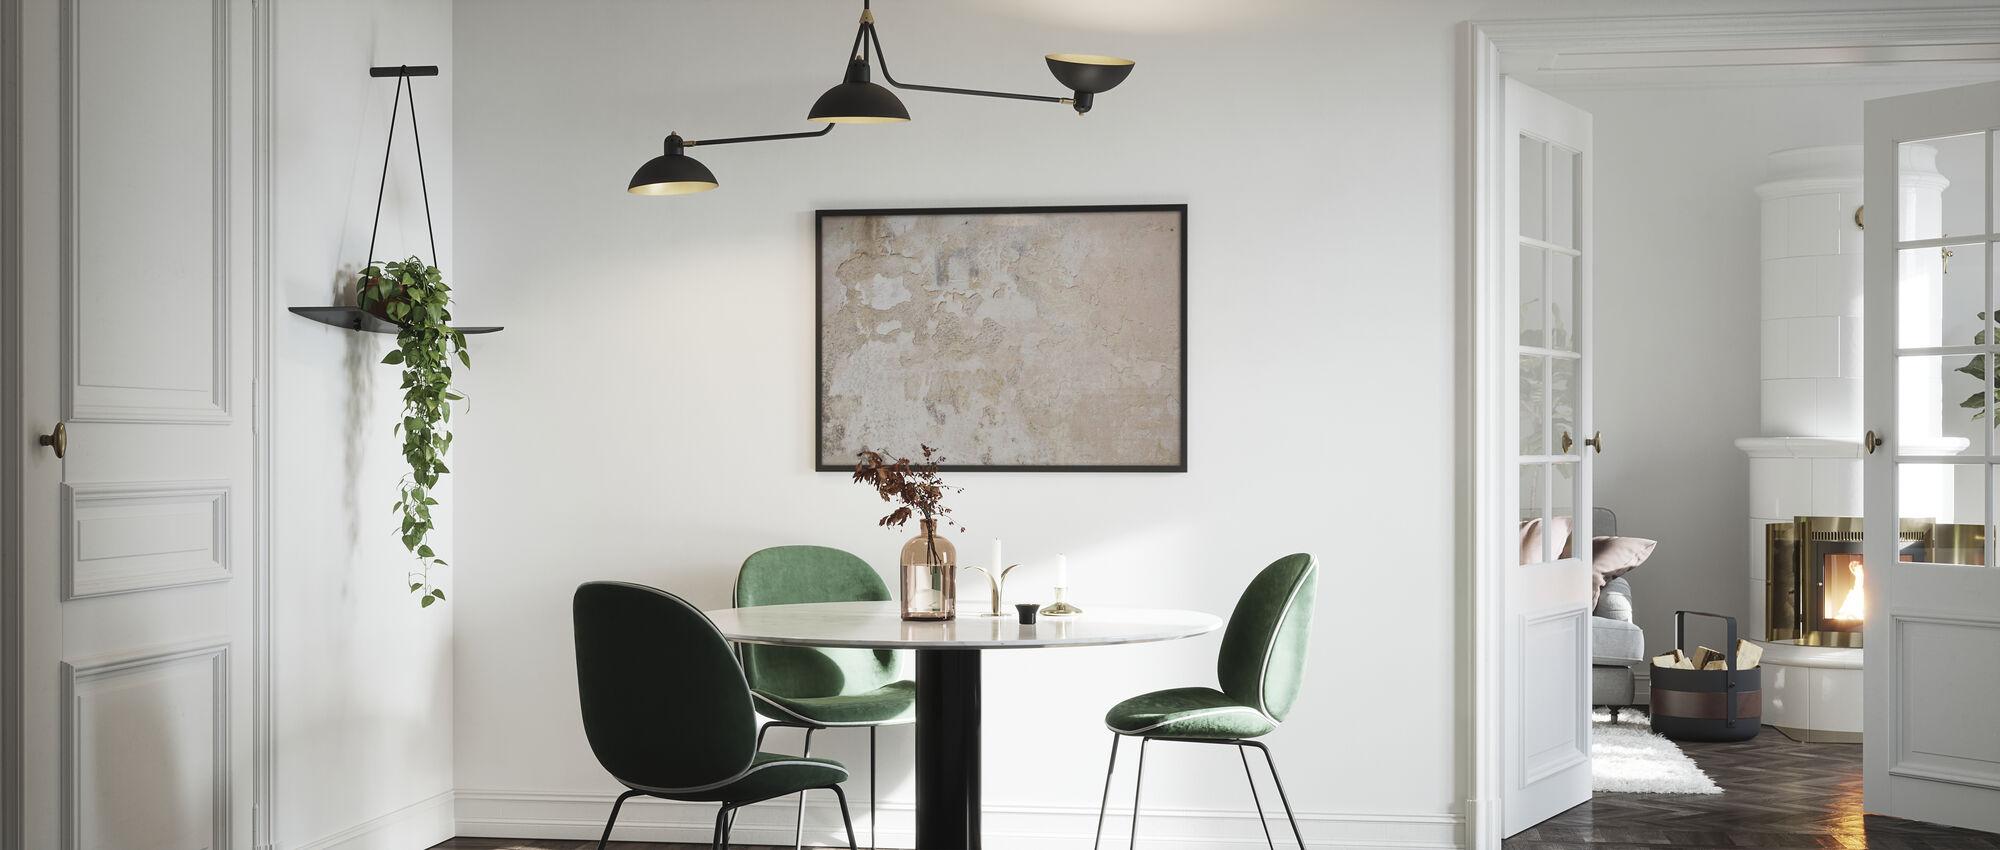 Light Street Wall - Poster - Kitchen